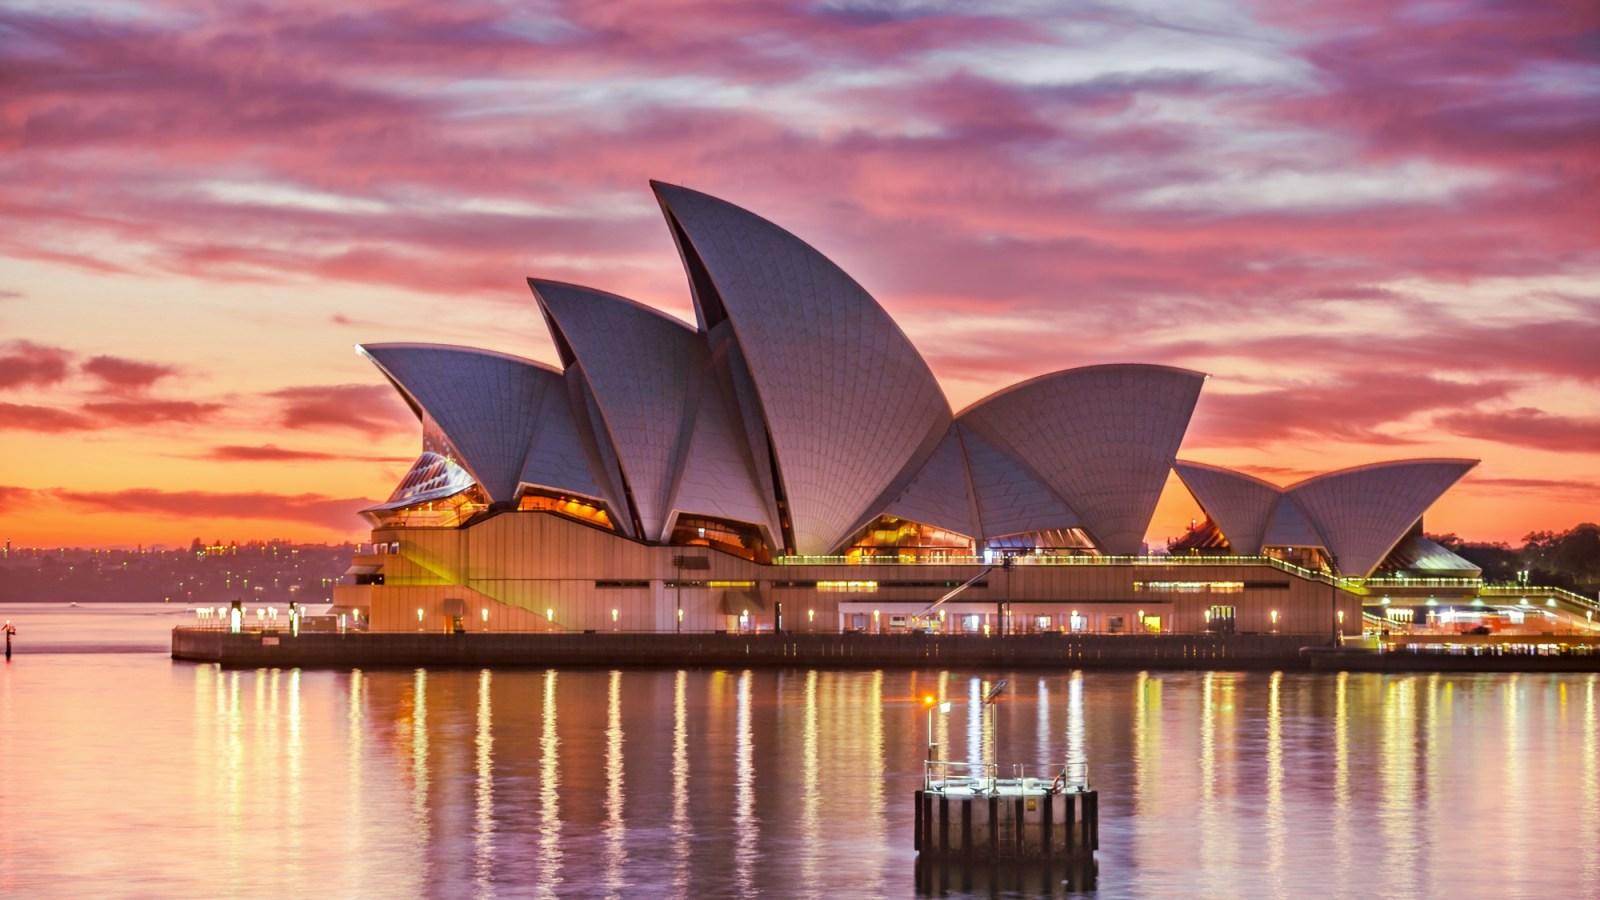 Image from Australia